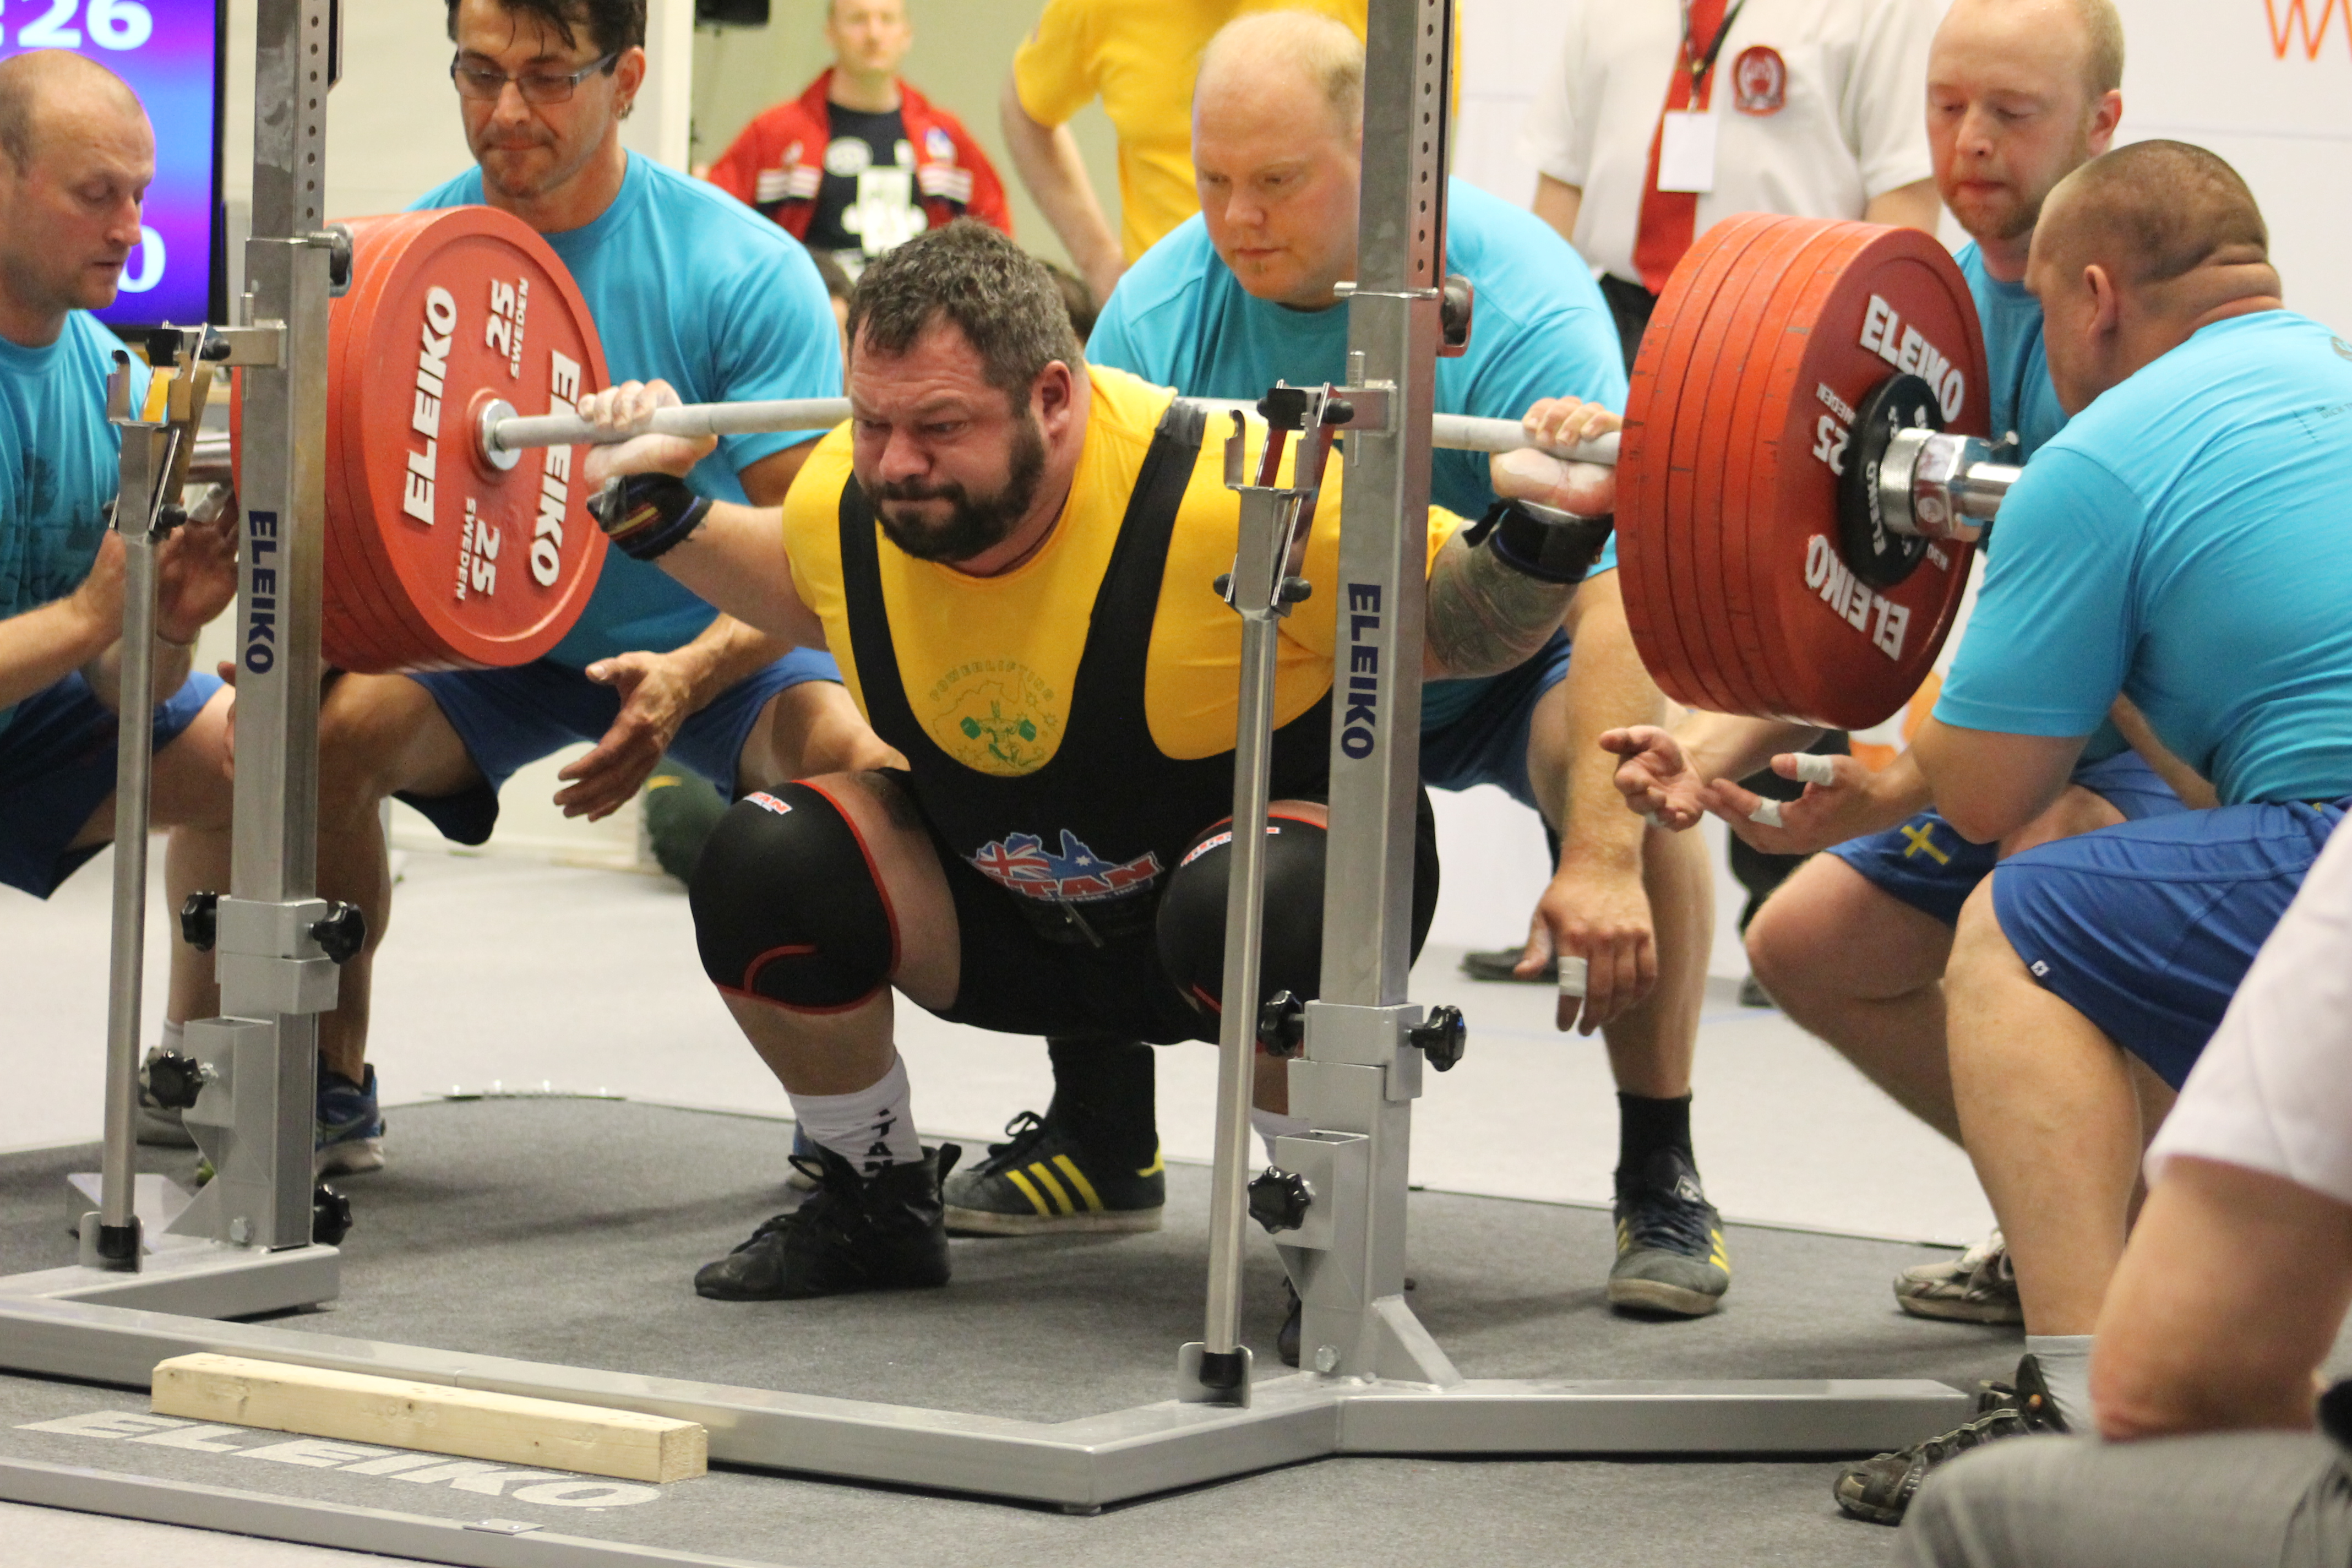 pritchard_squatting.JPG